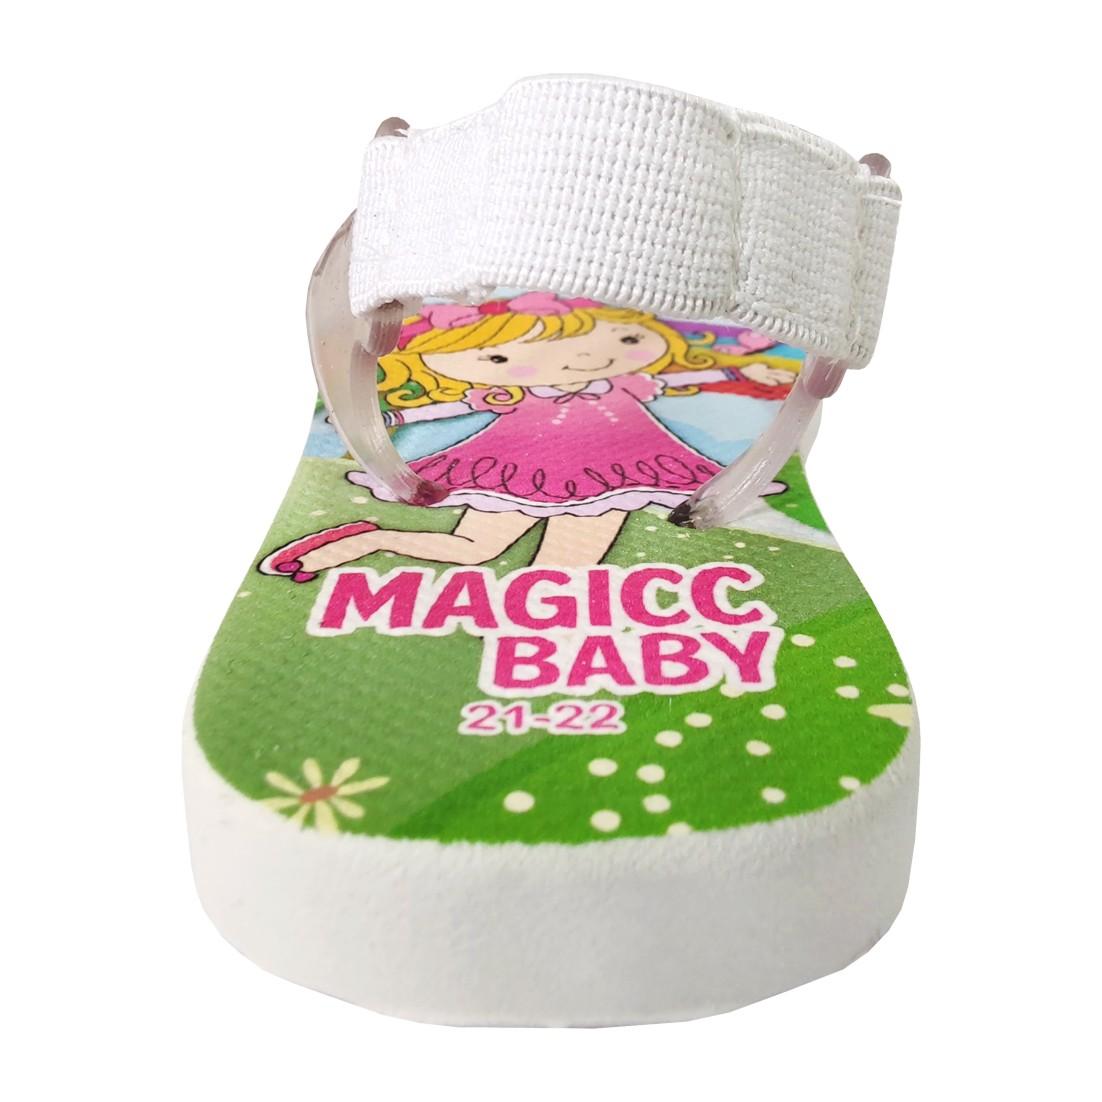 Chinelo Menina Bebê  Sandália Infantil Menininha Magicc Baby